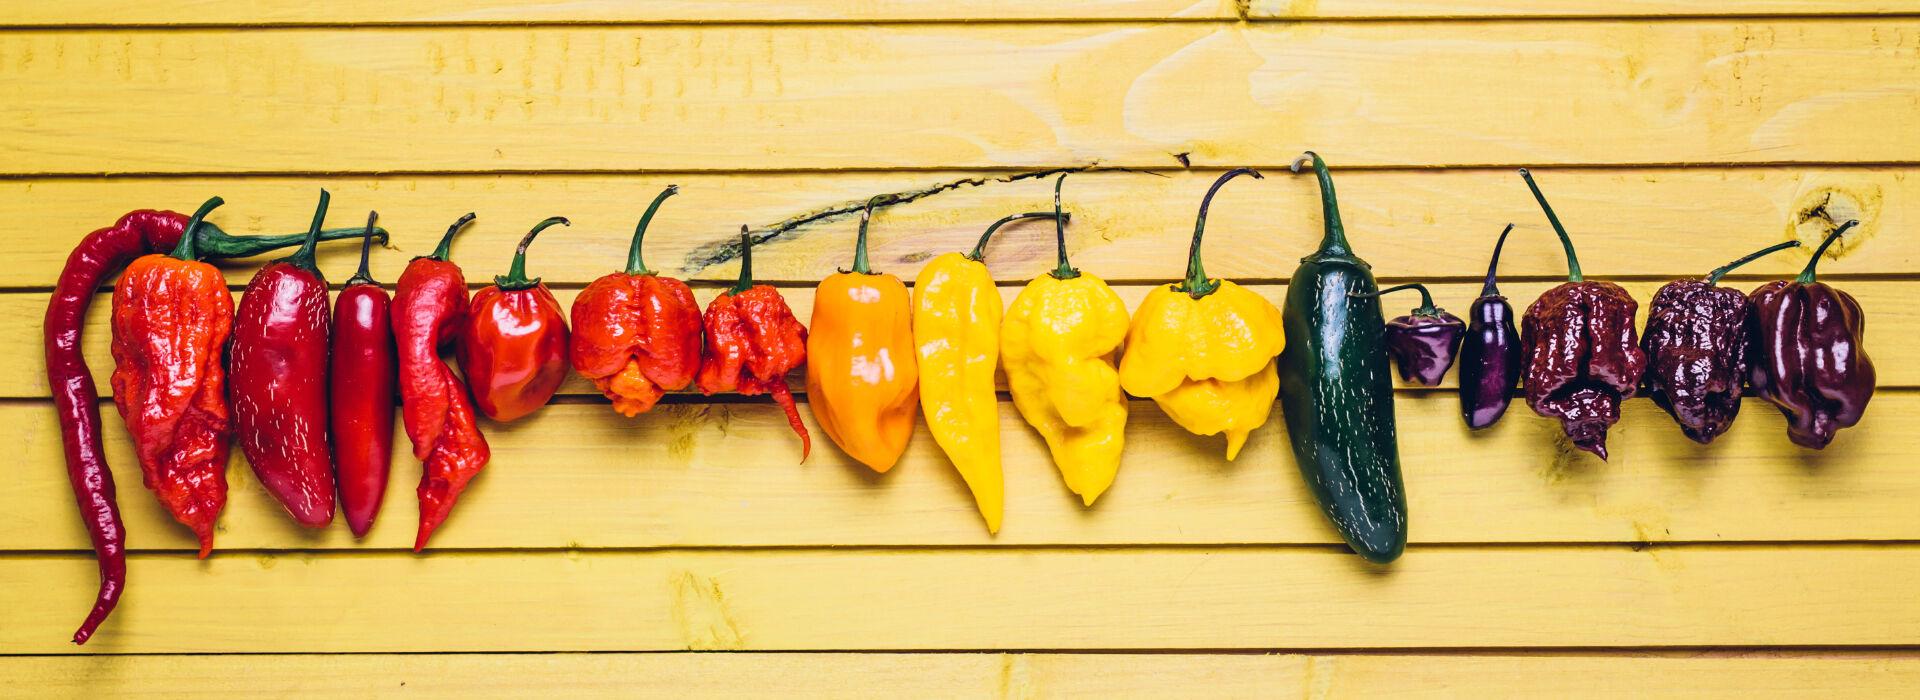 Gastrochili Chili Paprikák